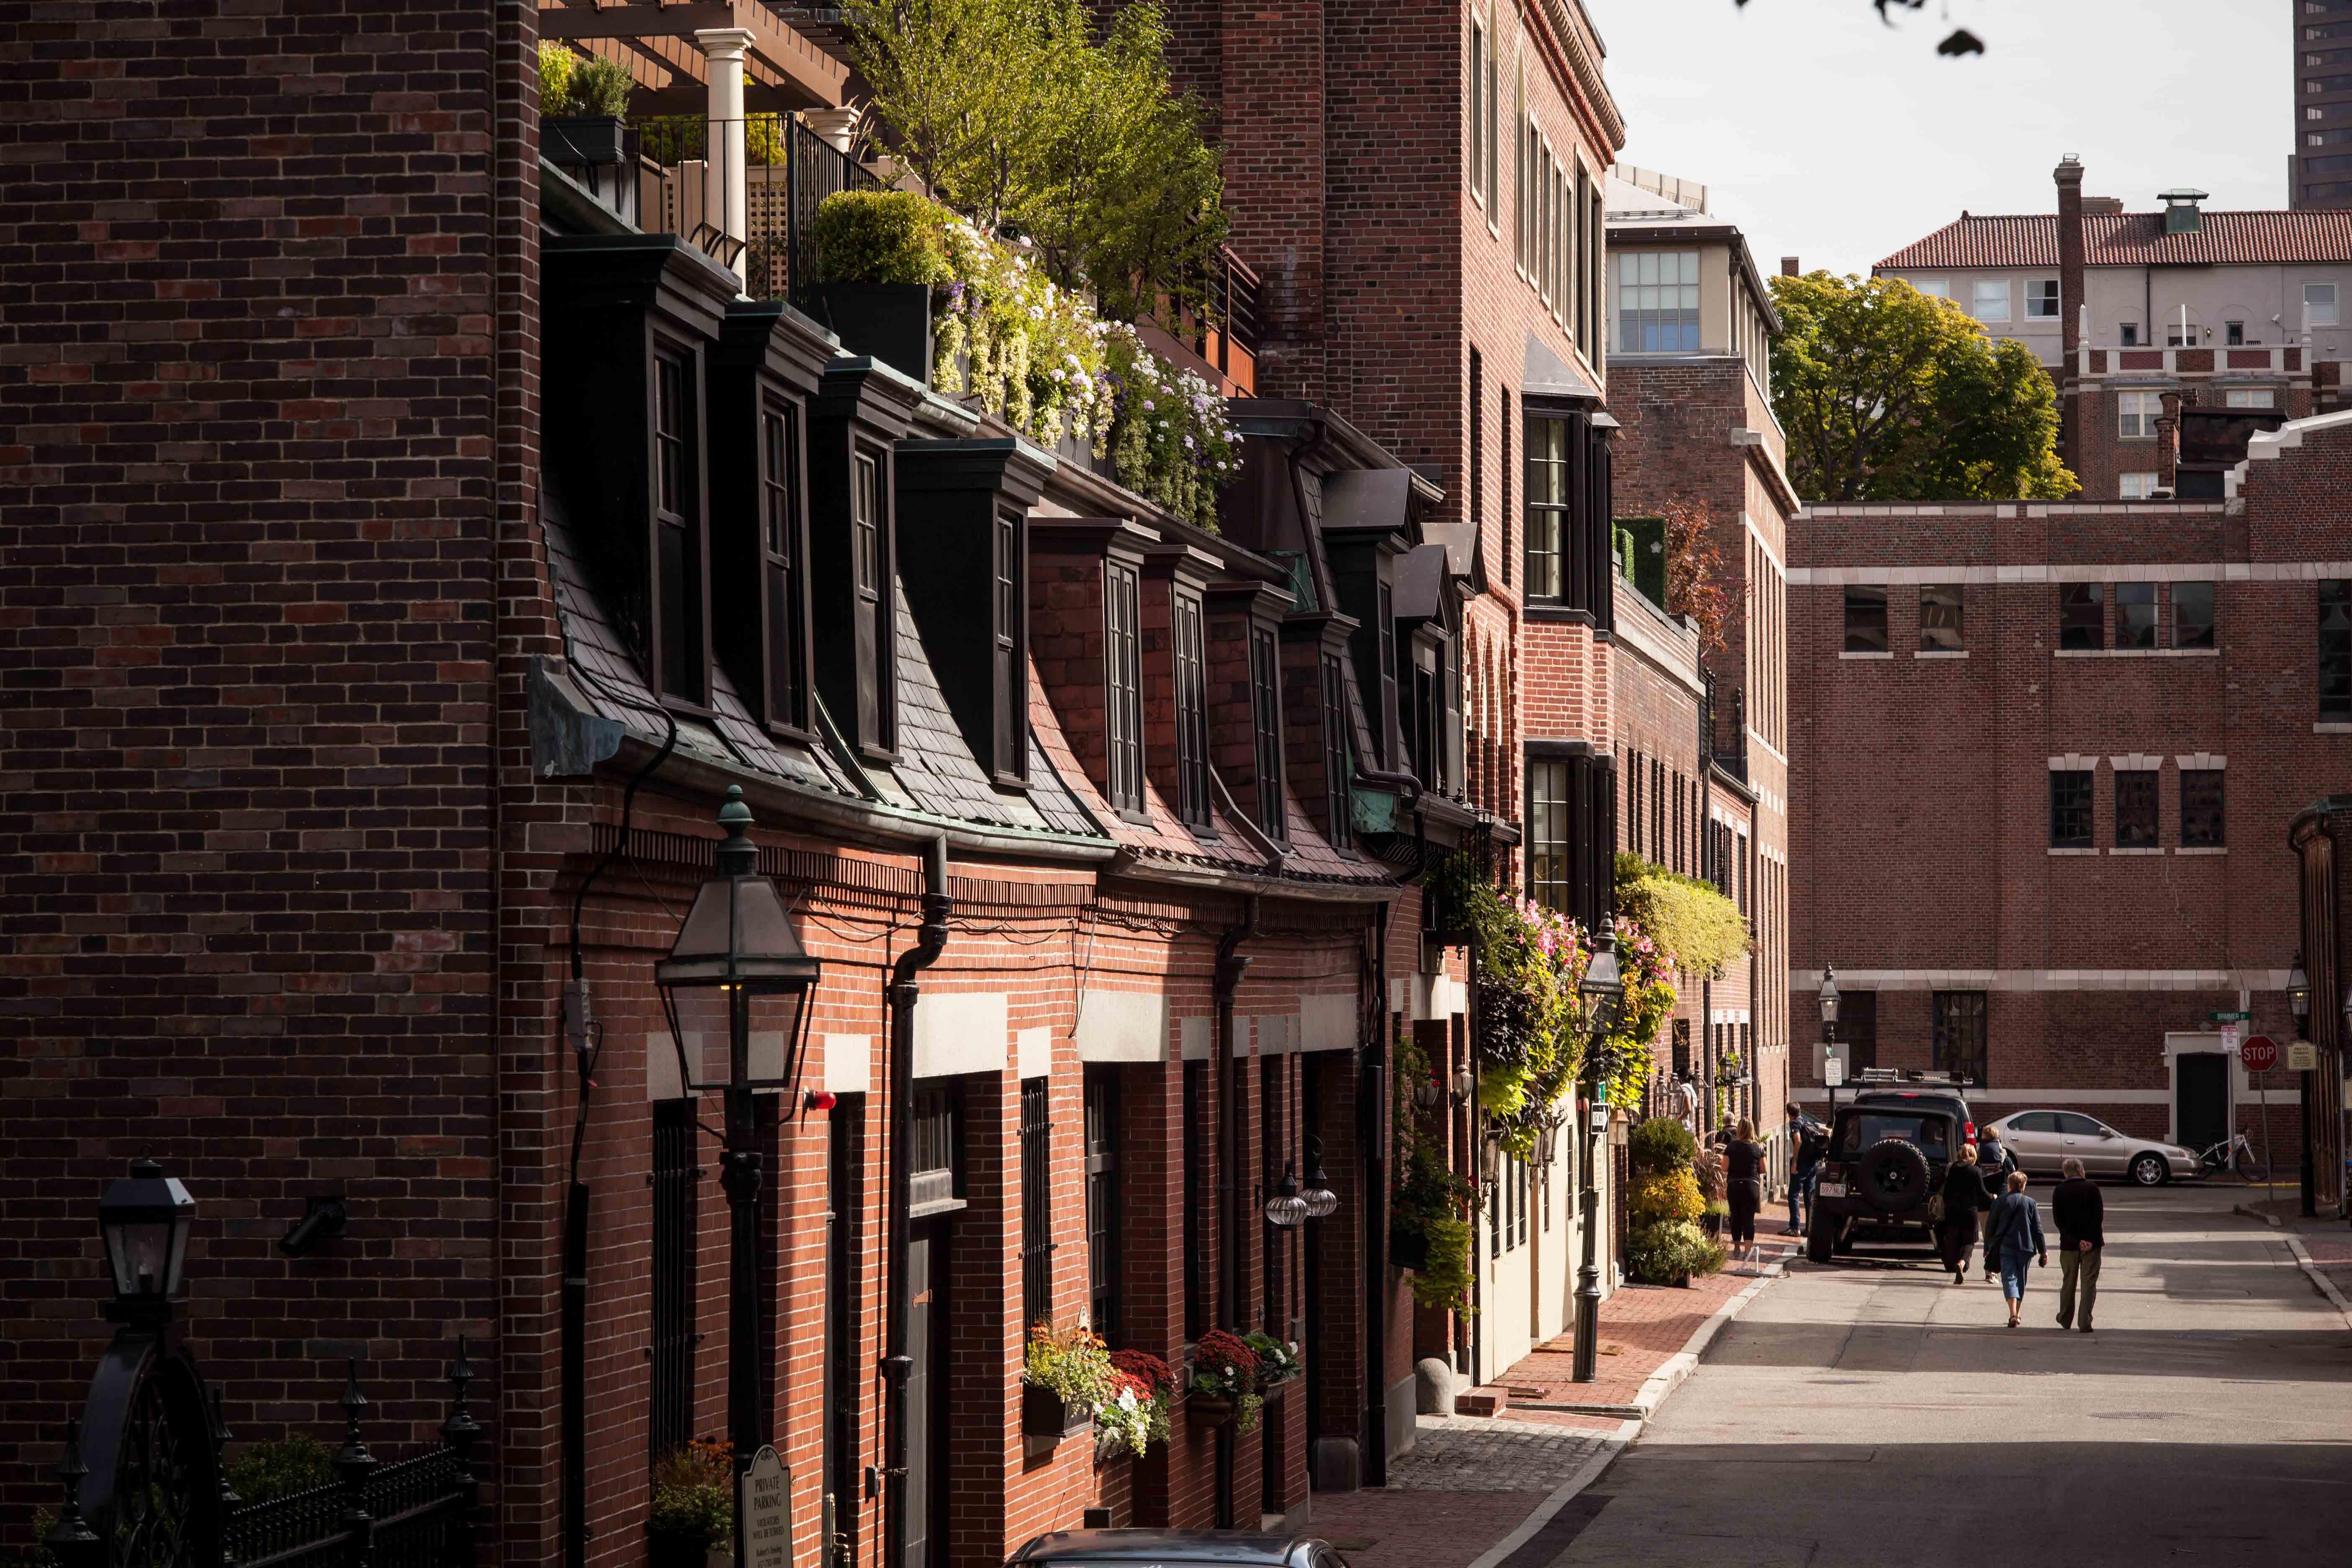 Image of Boston Street